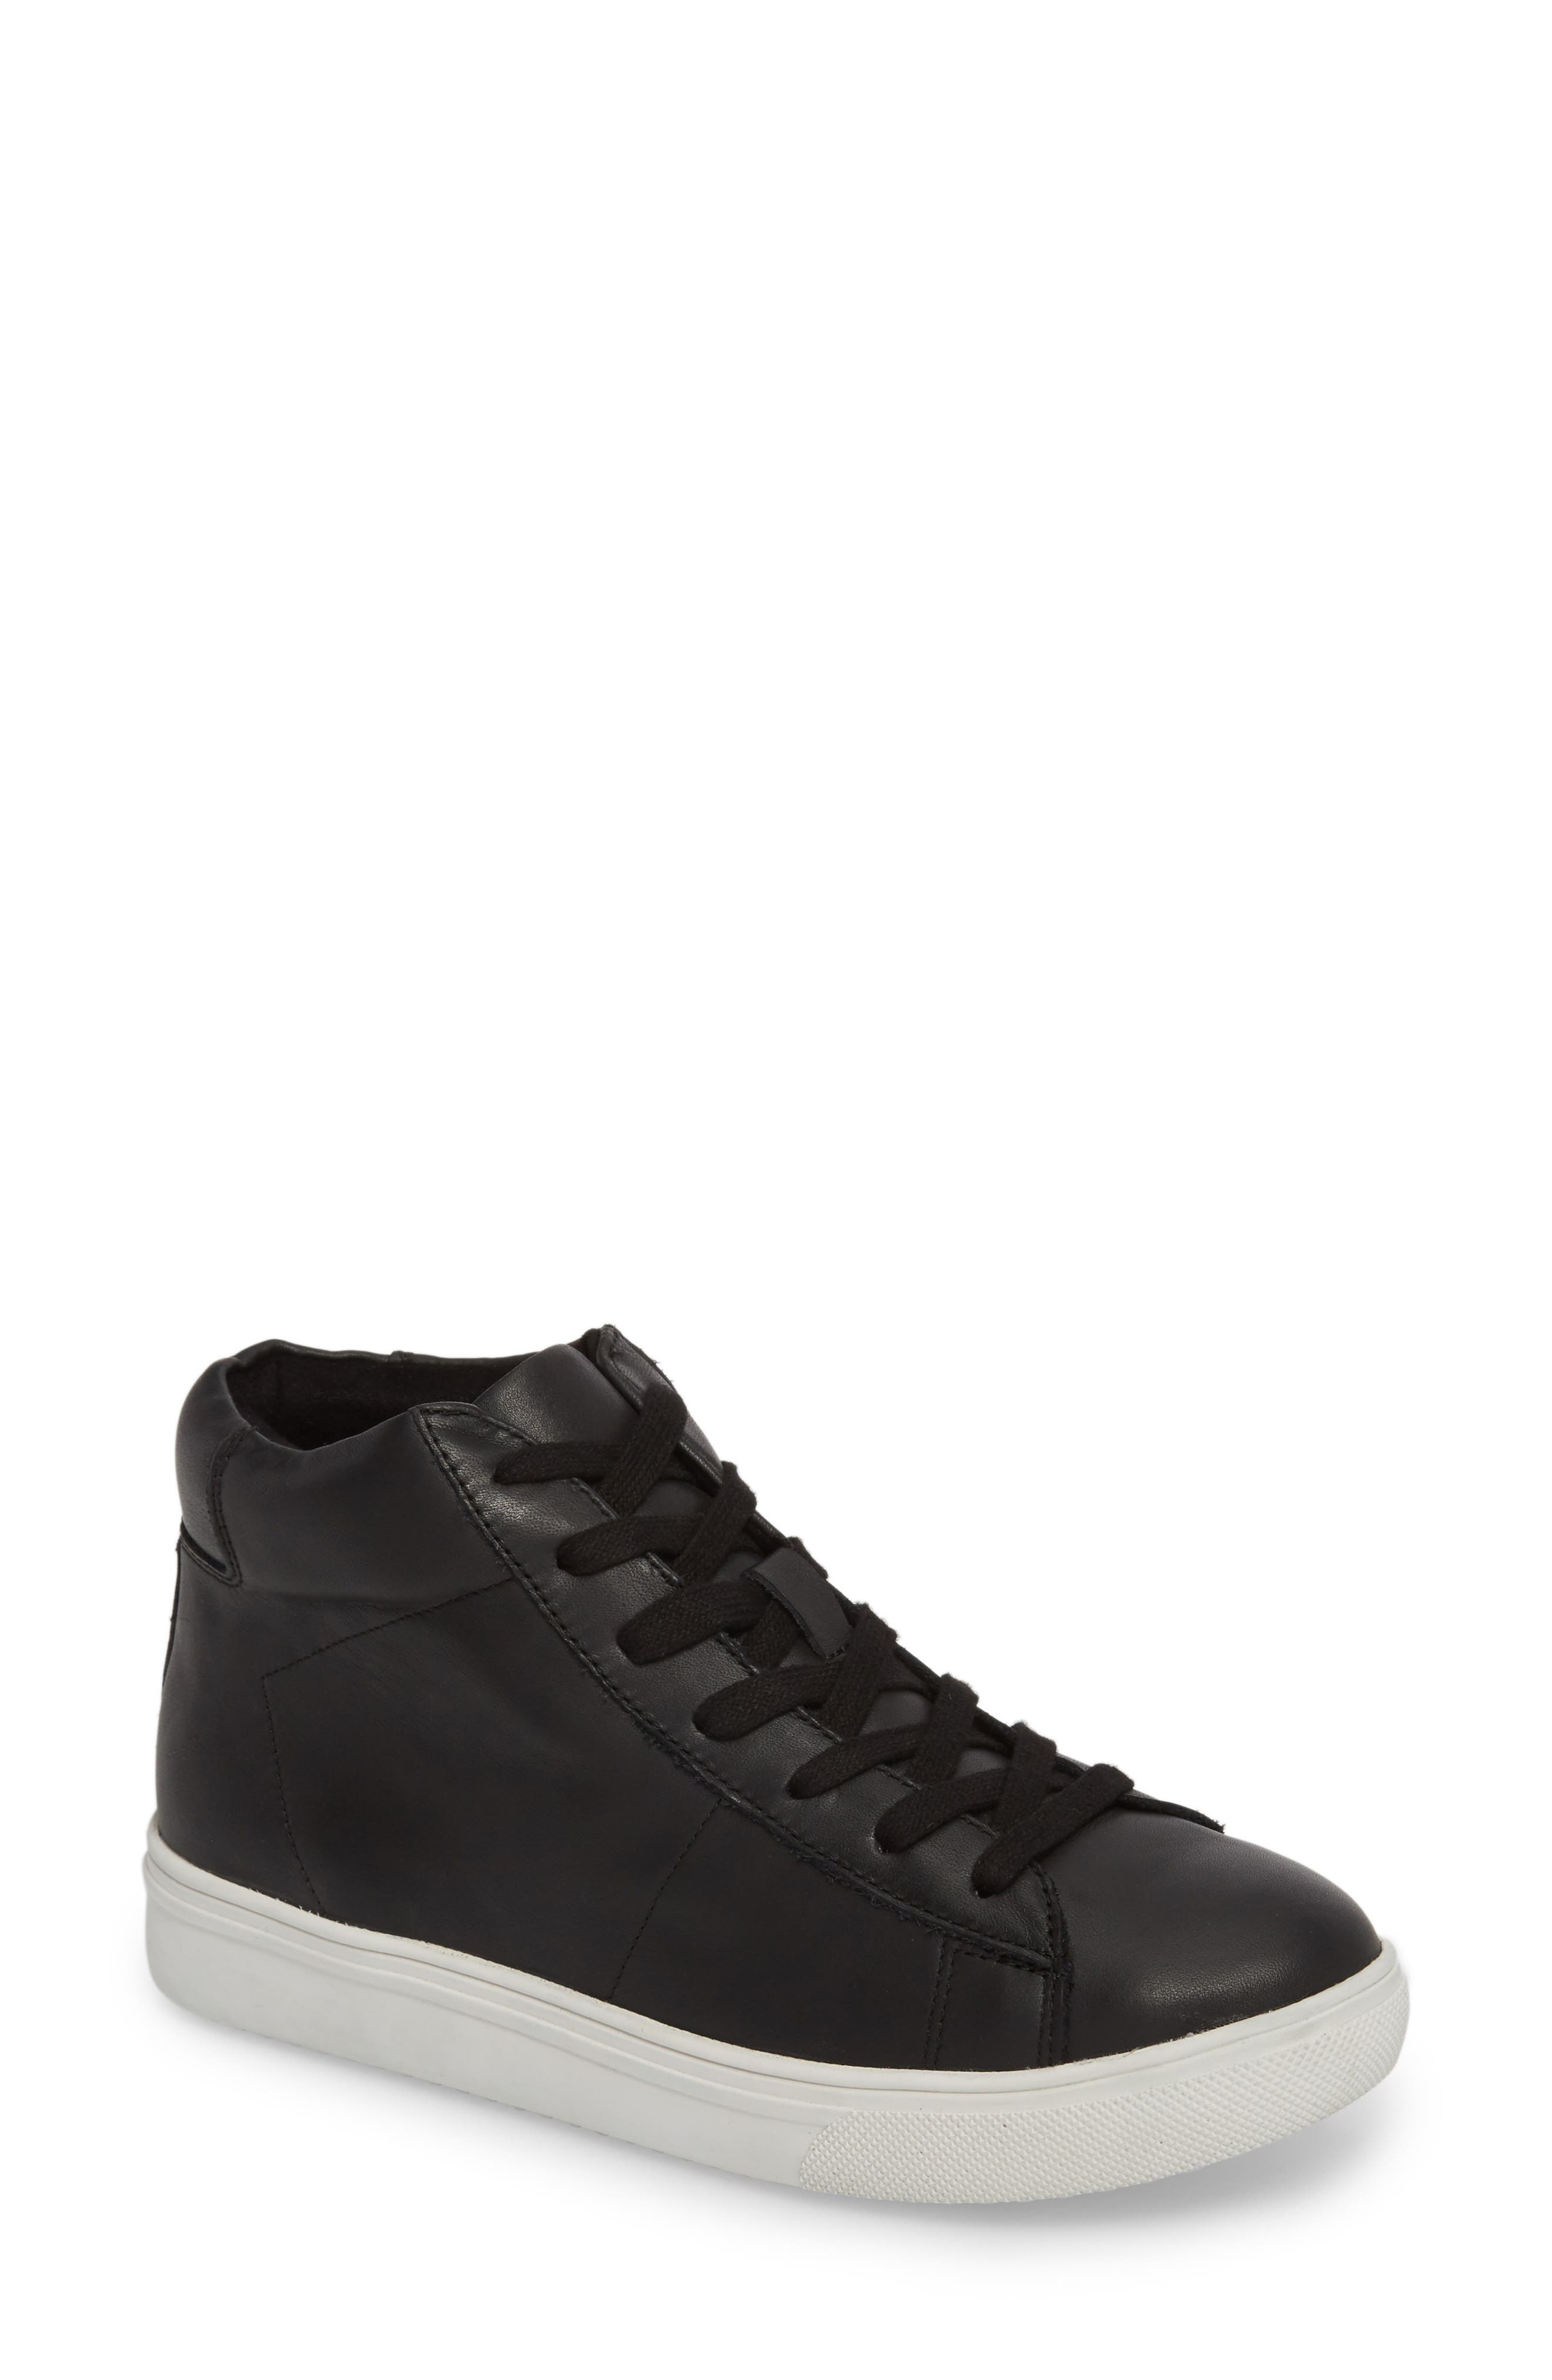 Main Image - Blondo Jax Waterproof High Top Sneaker (Women)